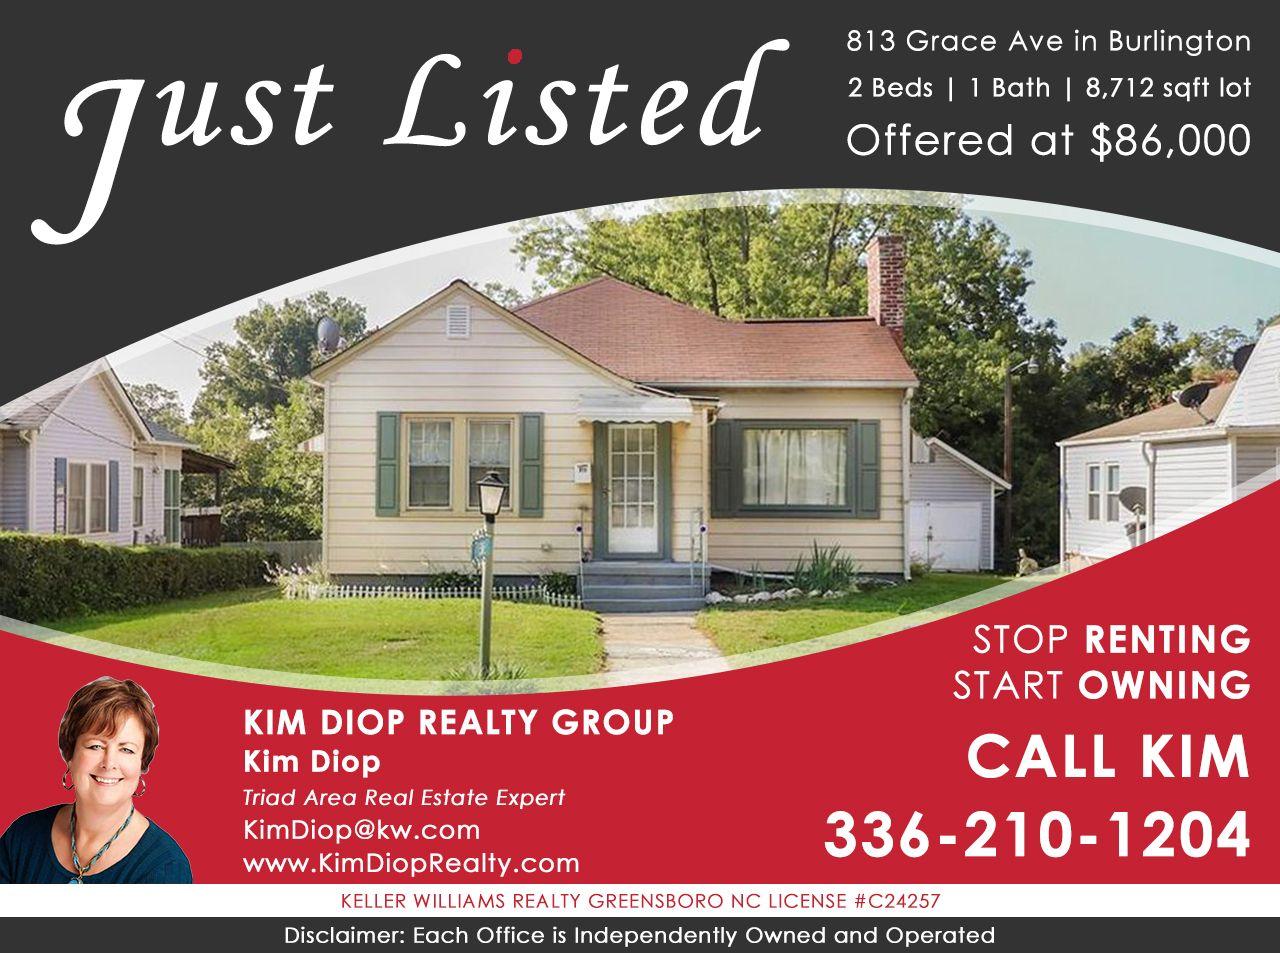 Just Listed 813 Grace Ave Burlington Nc 27217 Real Estate North Carolina Real Estate Estates